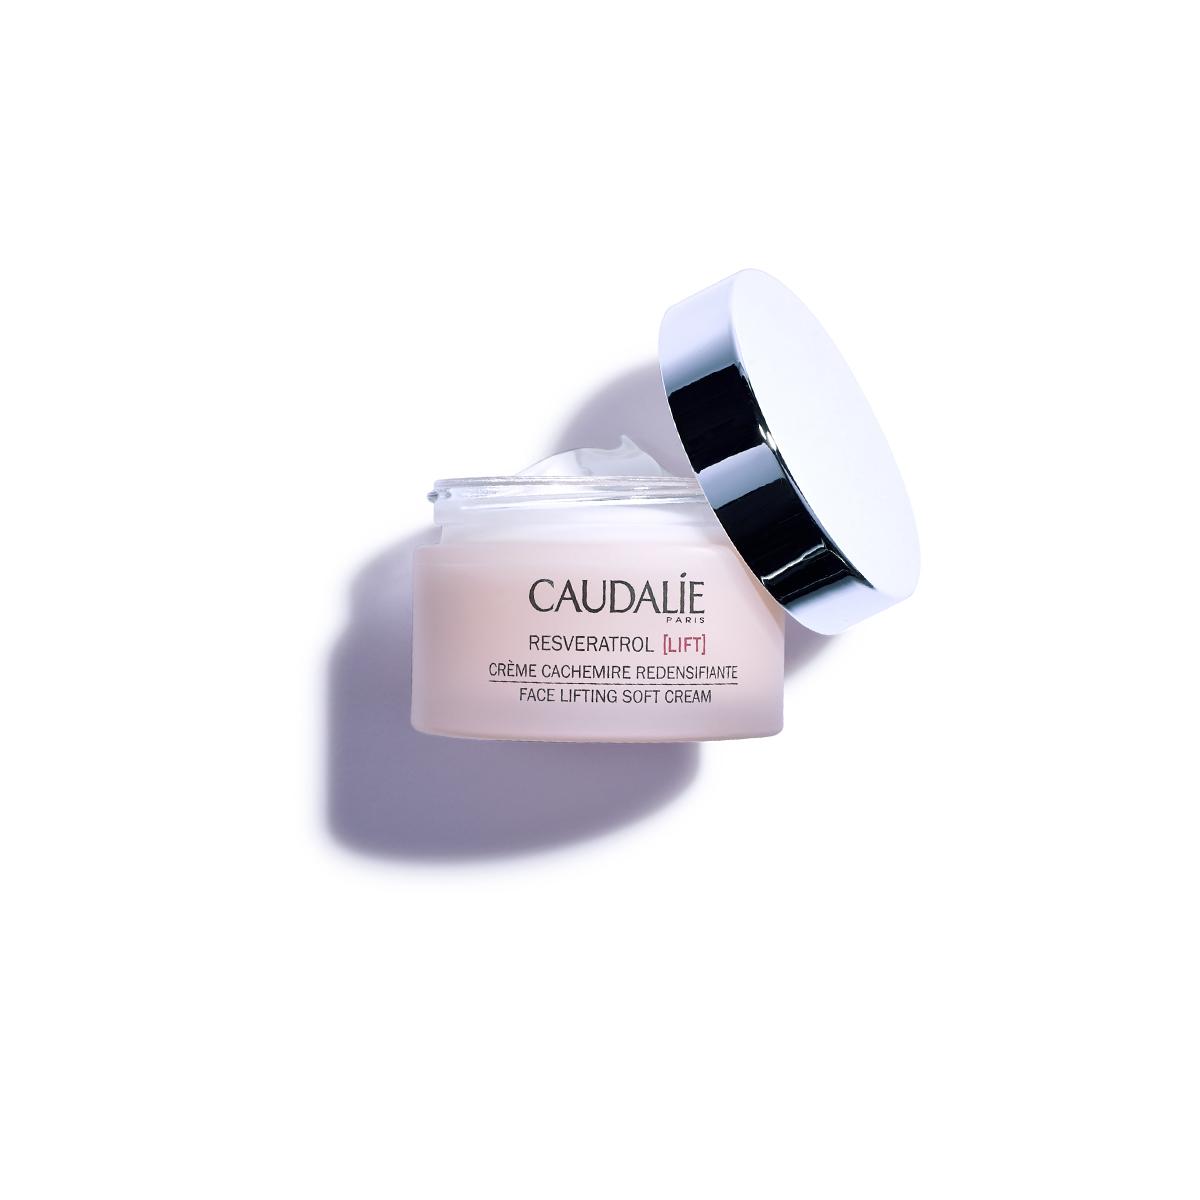 Resvératrol [Lift] Crème Cachemire Redensifiante